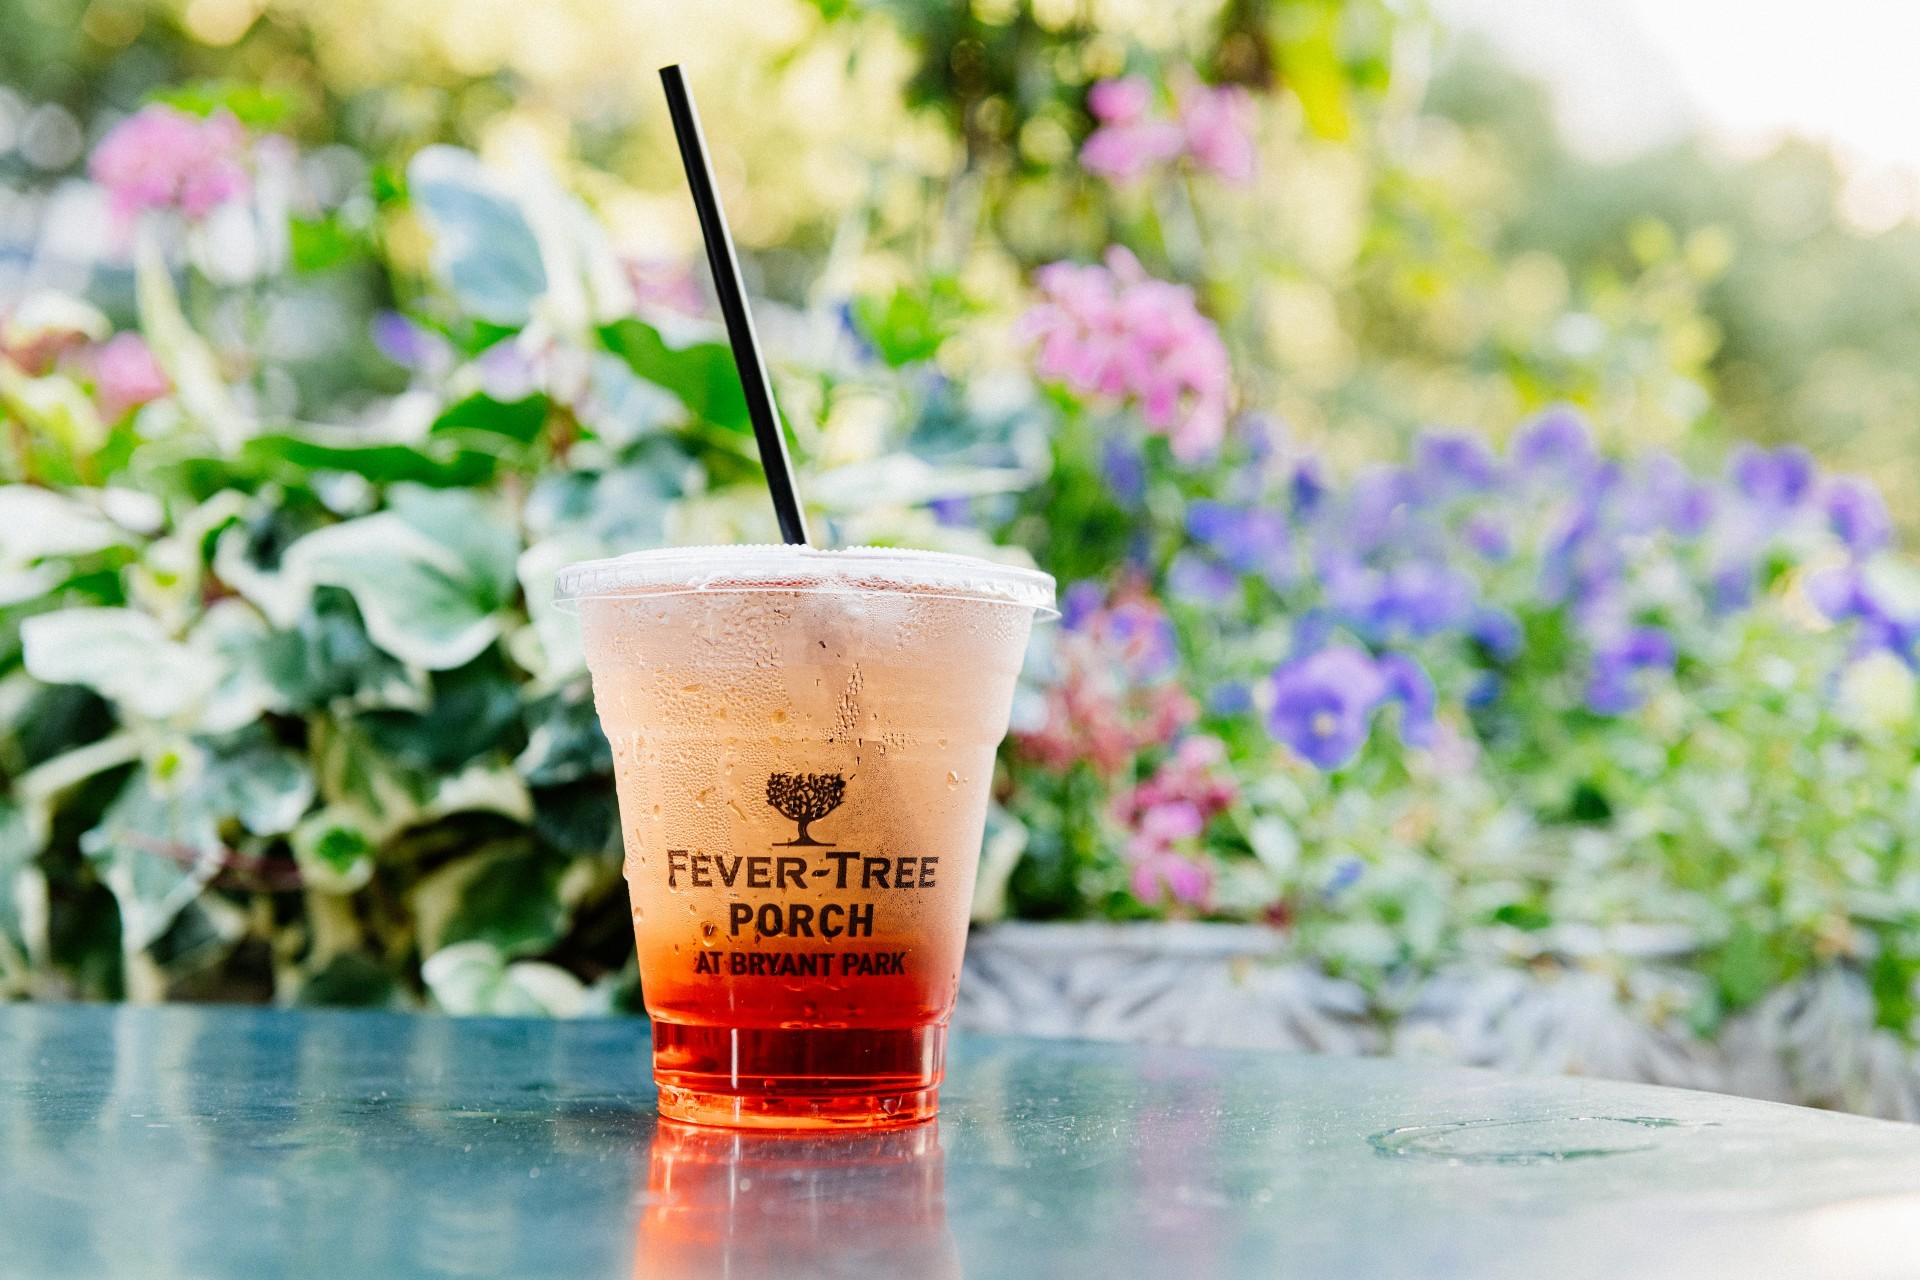 Fever-Tree Porch Bryant Park